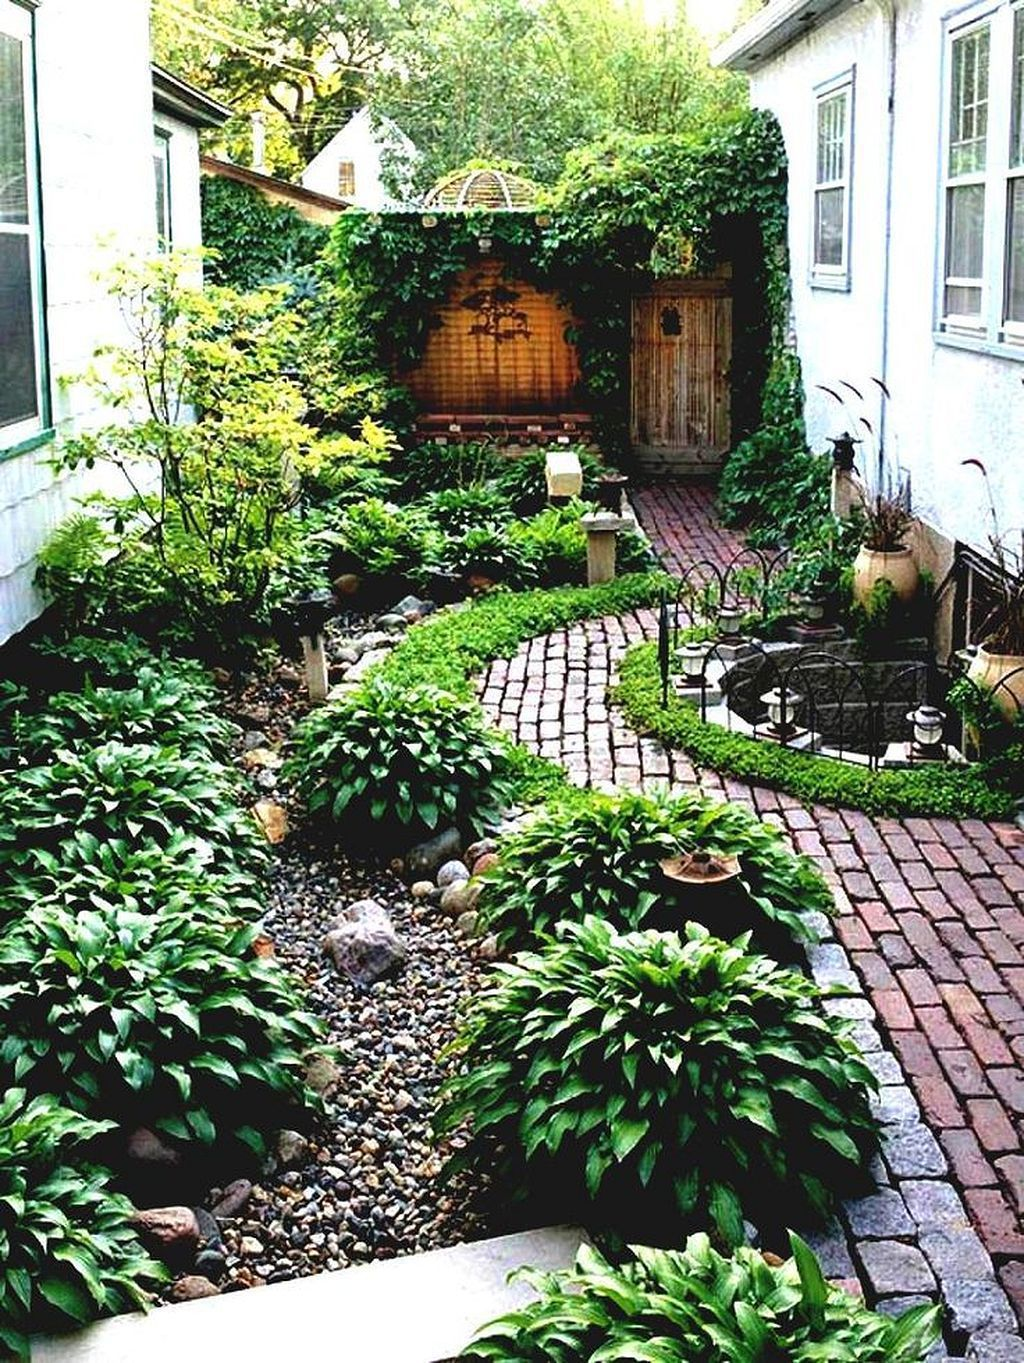 Medium Of Rock Garden Ideas Pinterest